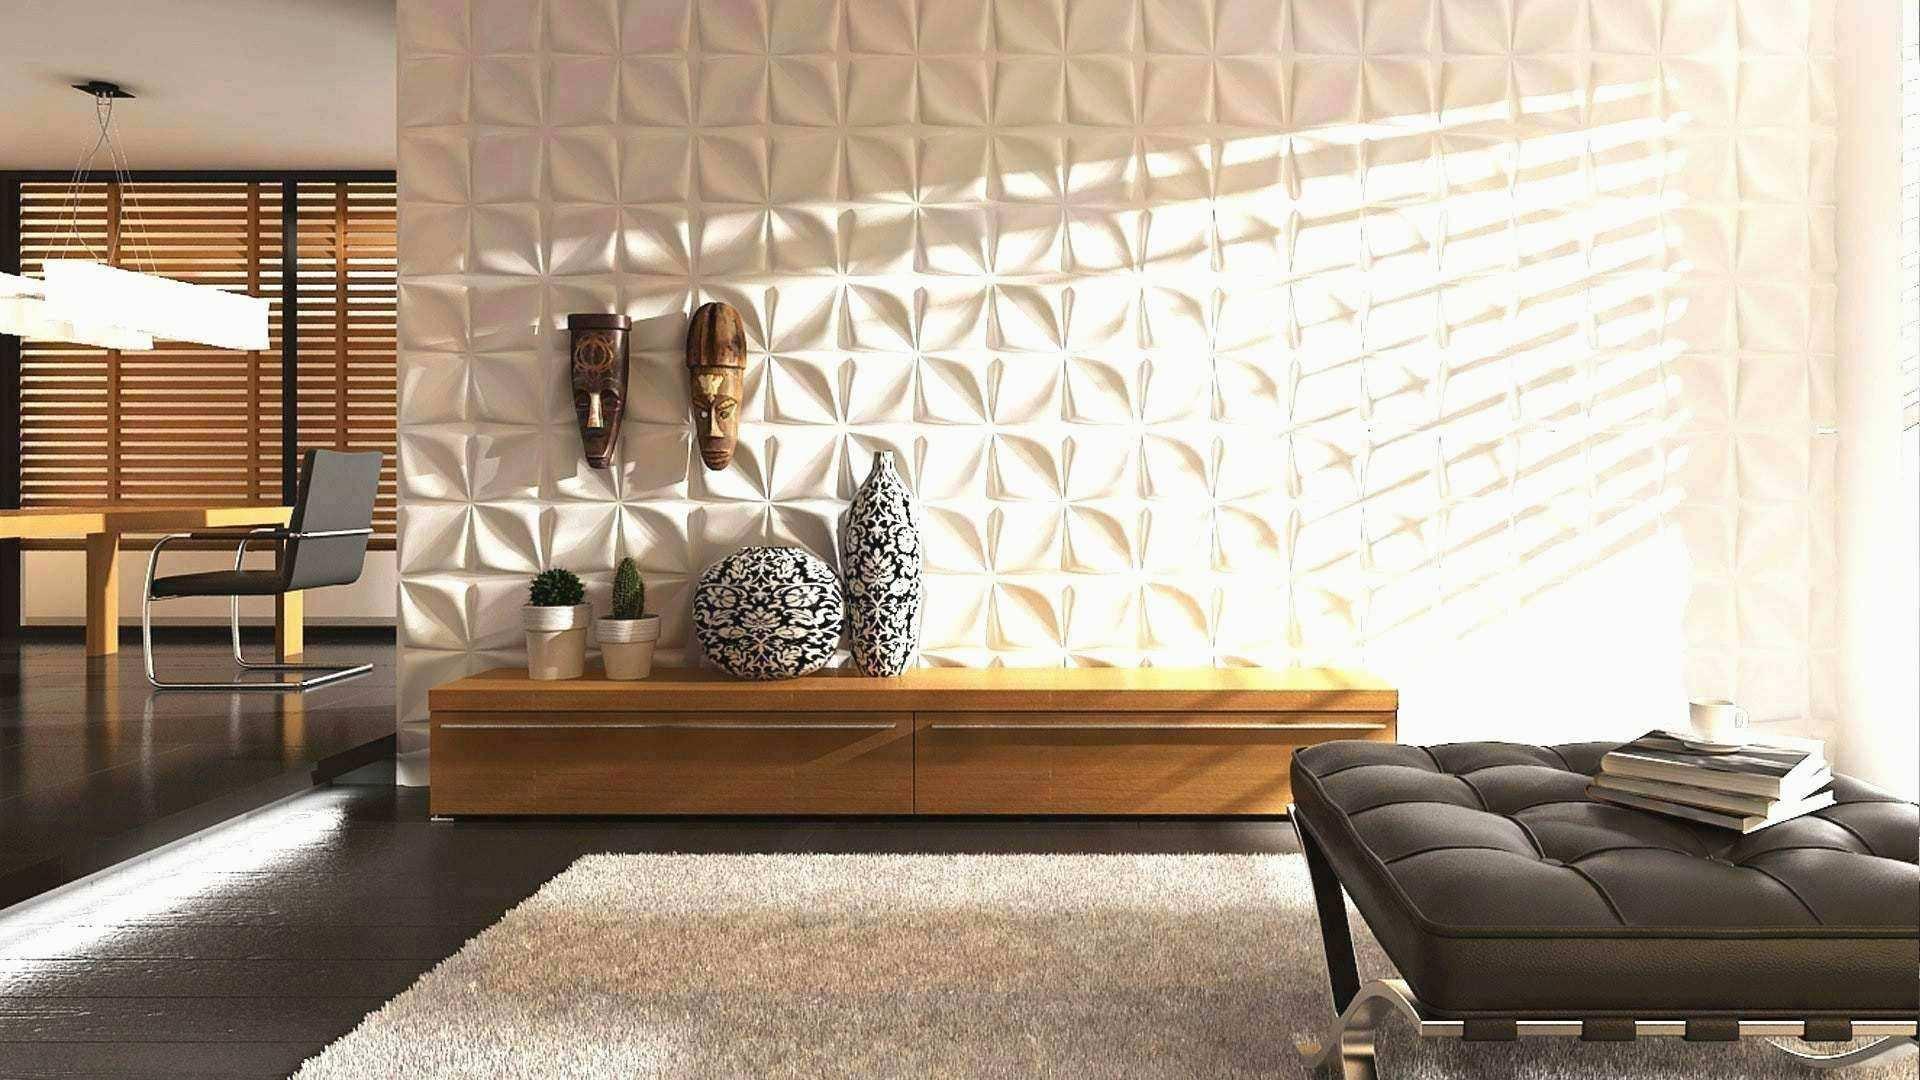 schone deko ideen schon fresh wohnzimmer ideen ausmalen concept of schone deko ideen